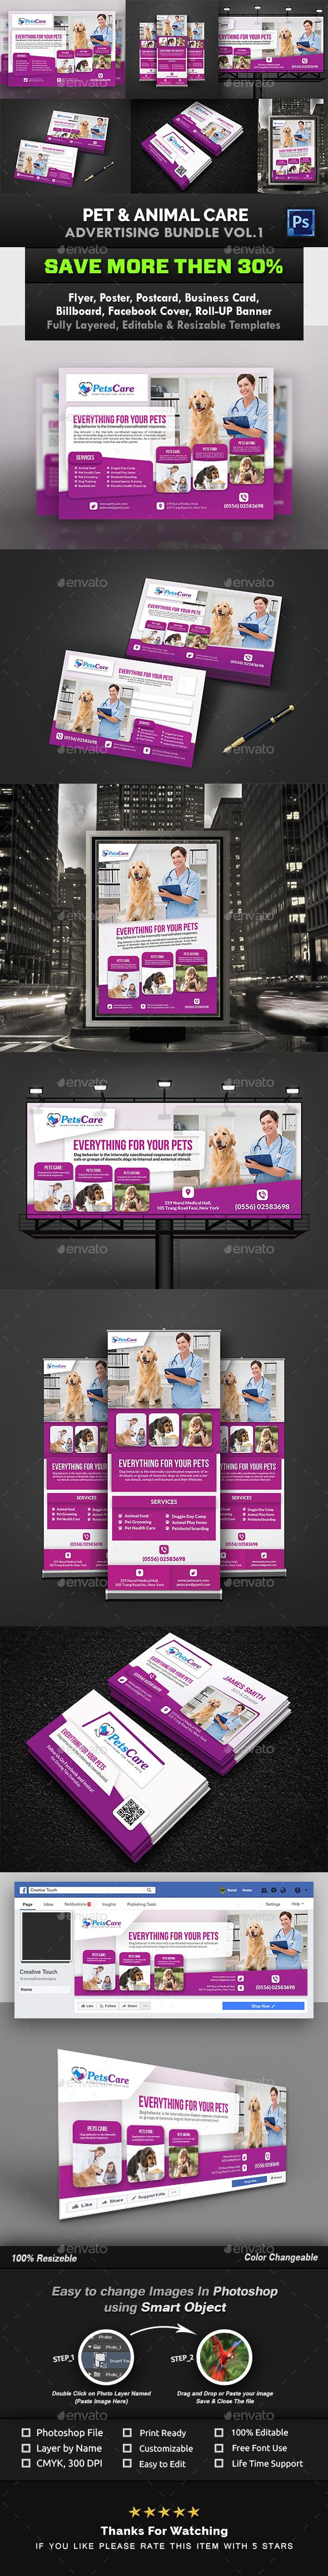 Pet Care Advertising Bundle Vol.1 - Signage Print Templates